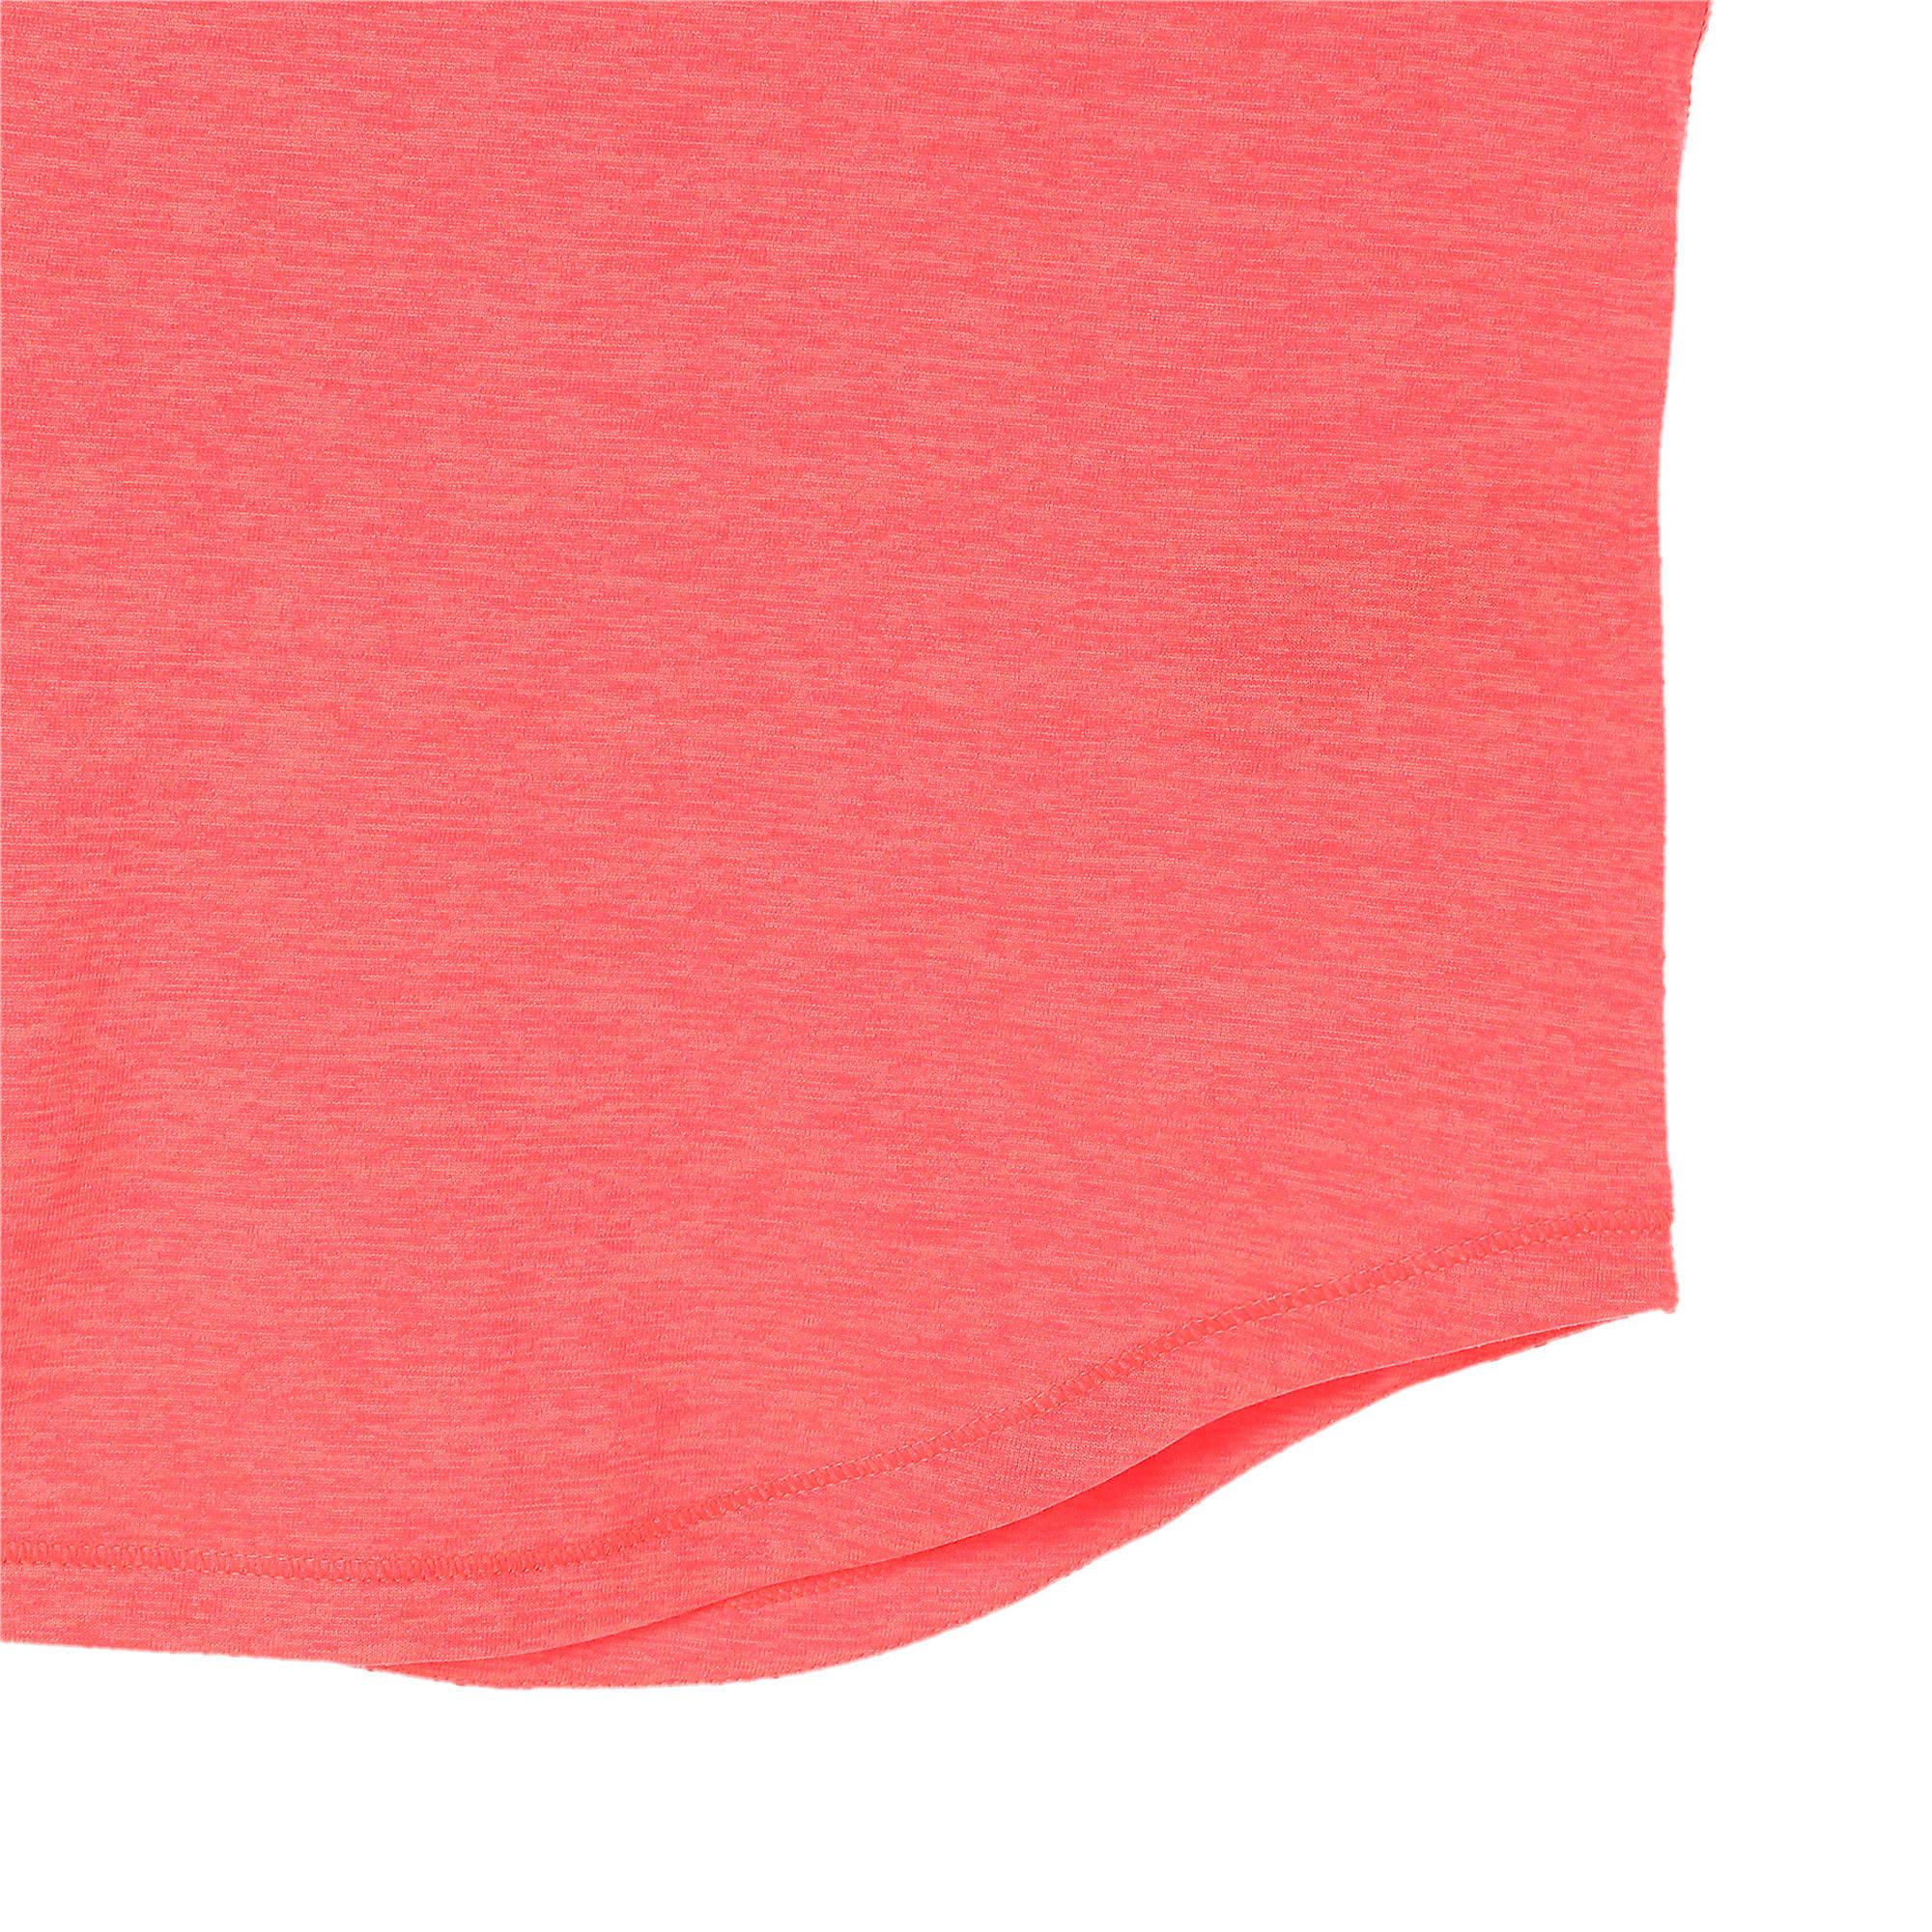 Thumbnail 9 of ヘザー キャット ウィメンズ ランニング Tシャツ 半袖, Pink Alert, medium-JPN